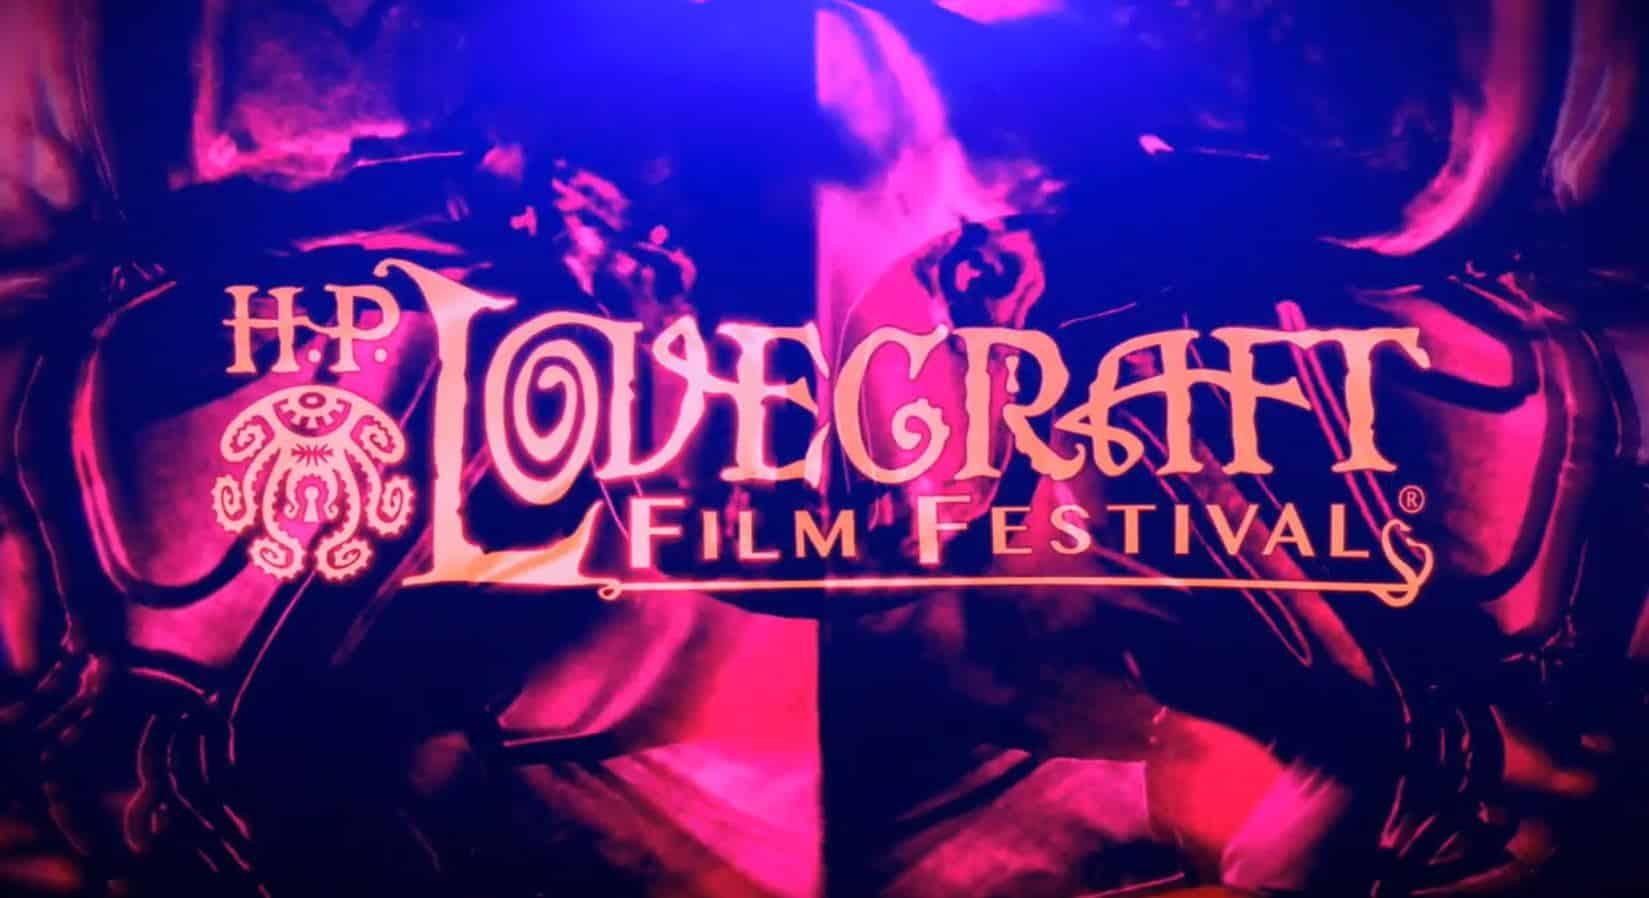 The H.P. Lovecraft Film Festival 2020 Press Announcement